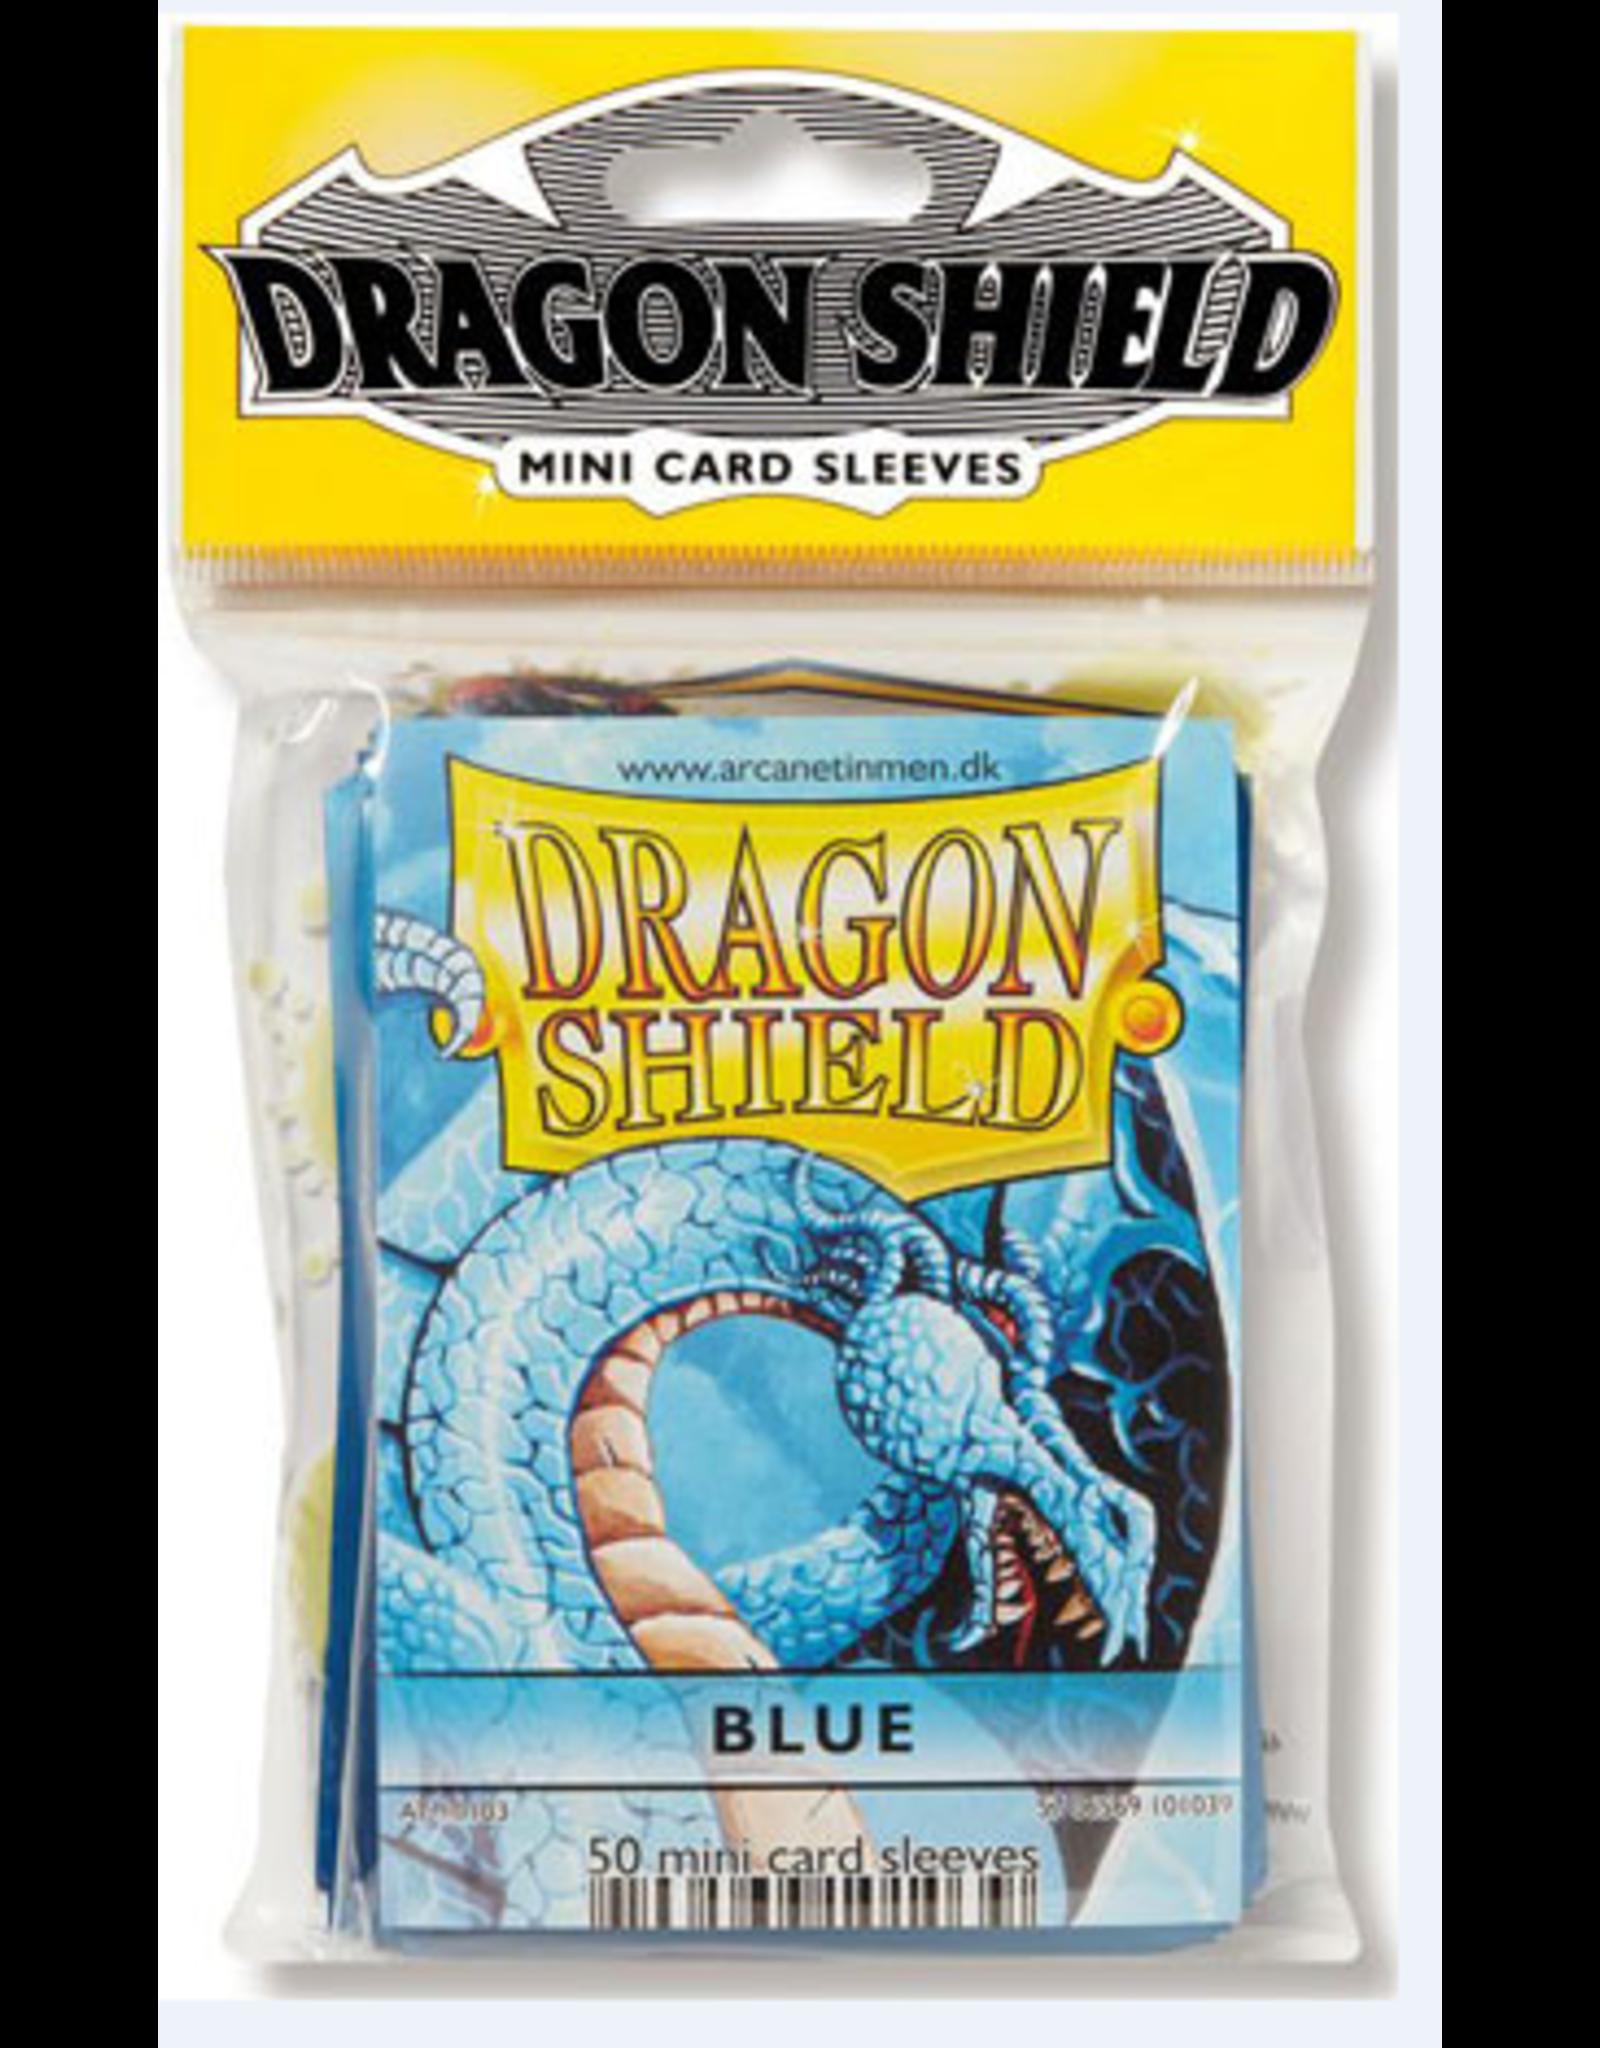 Dragon Shield Mini Sleeves - Blue (50 ct. in bag)